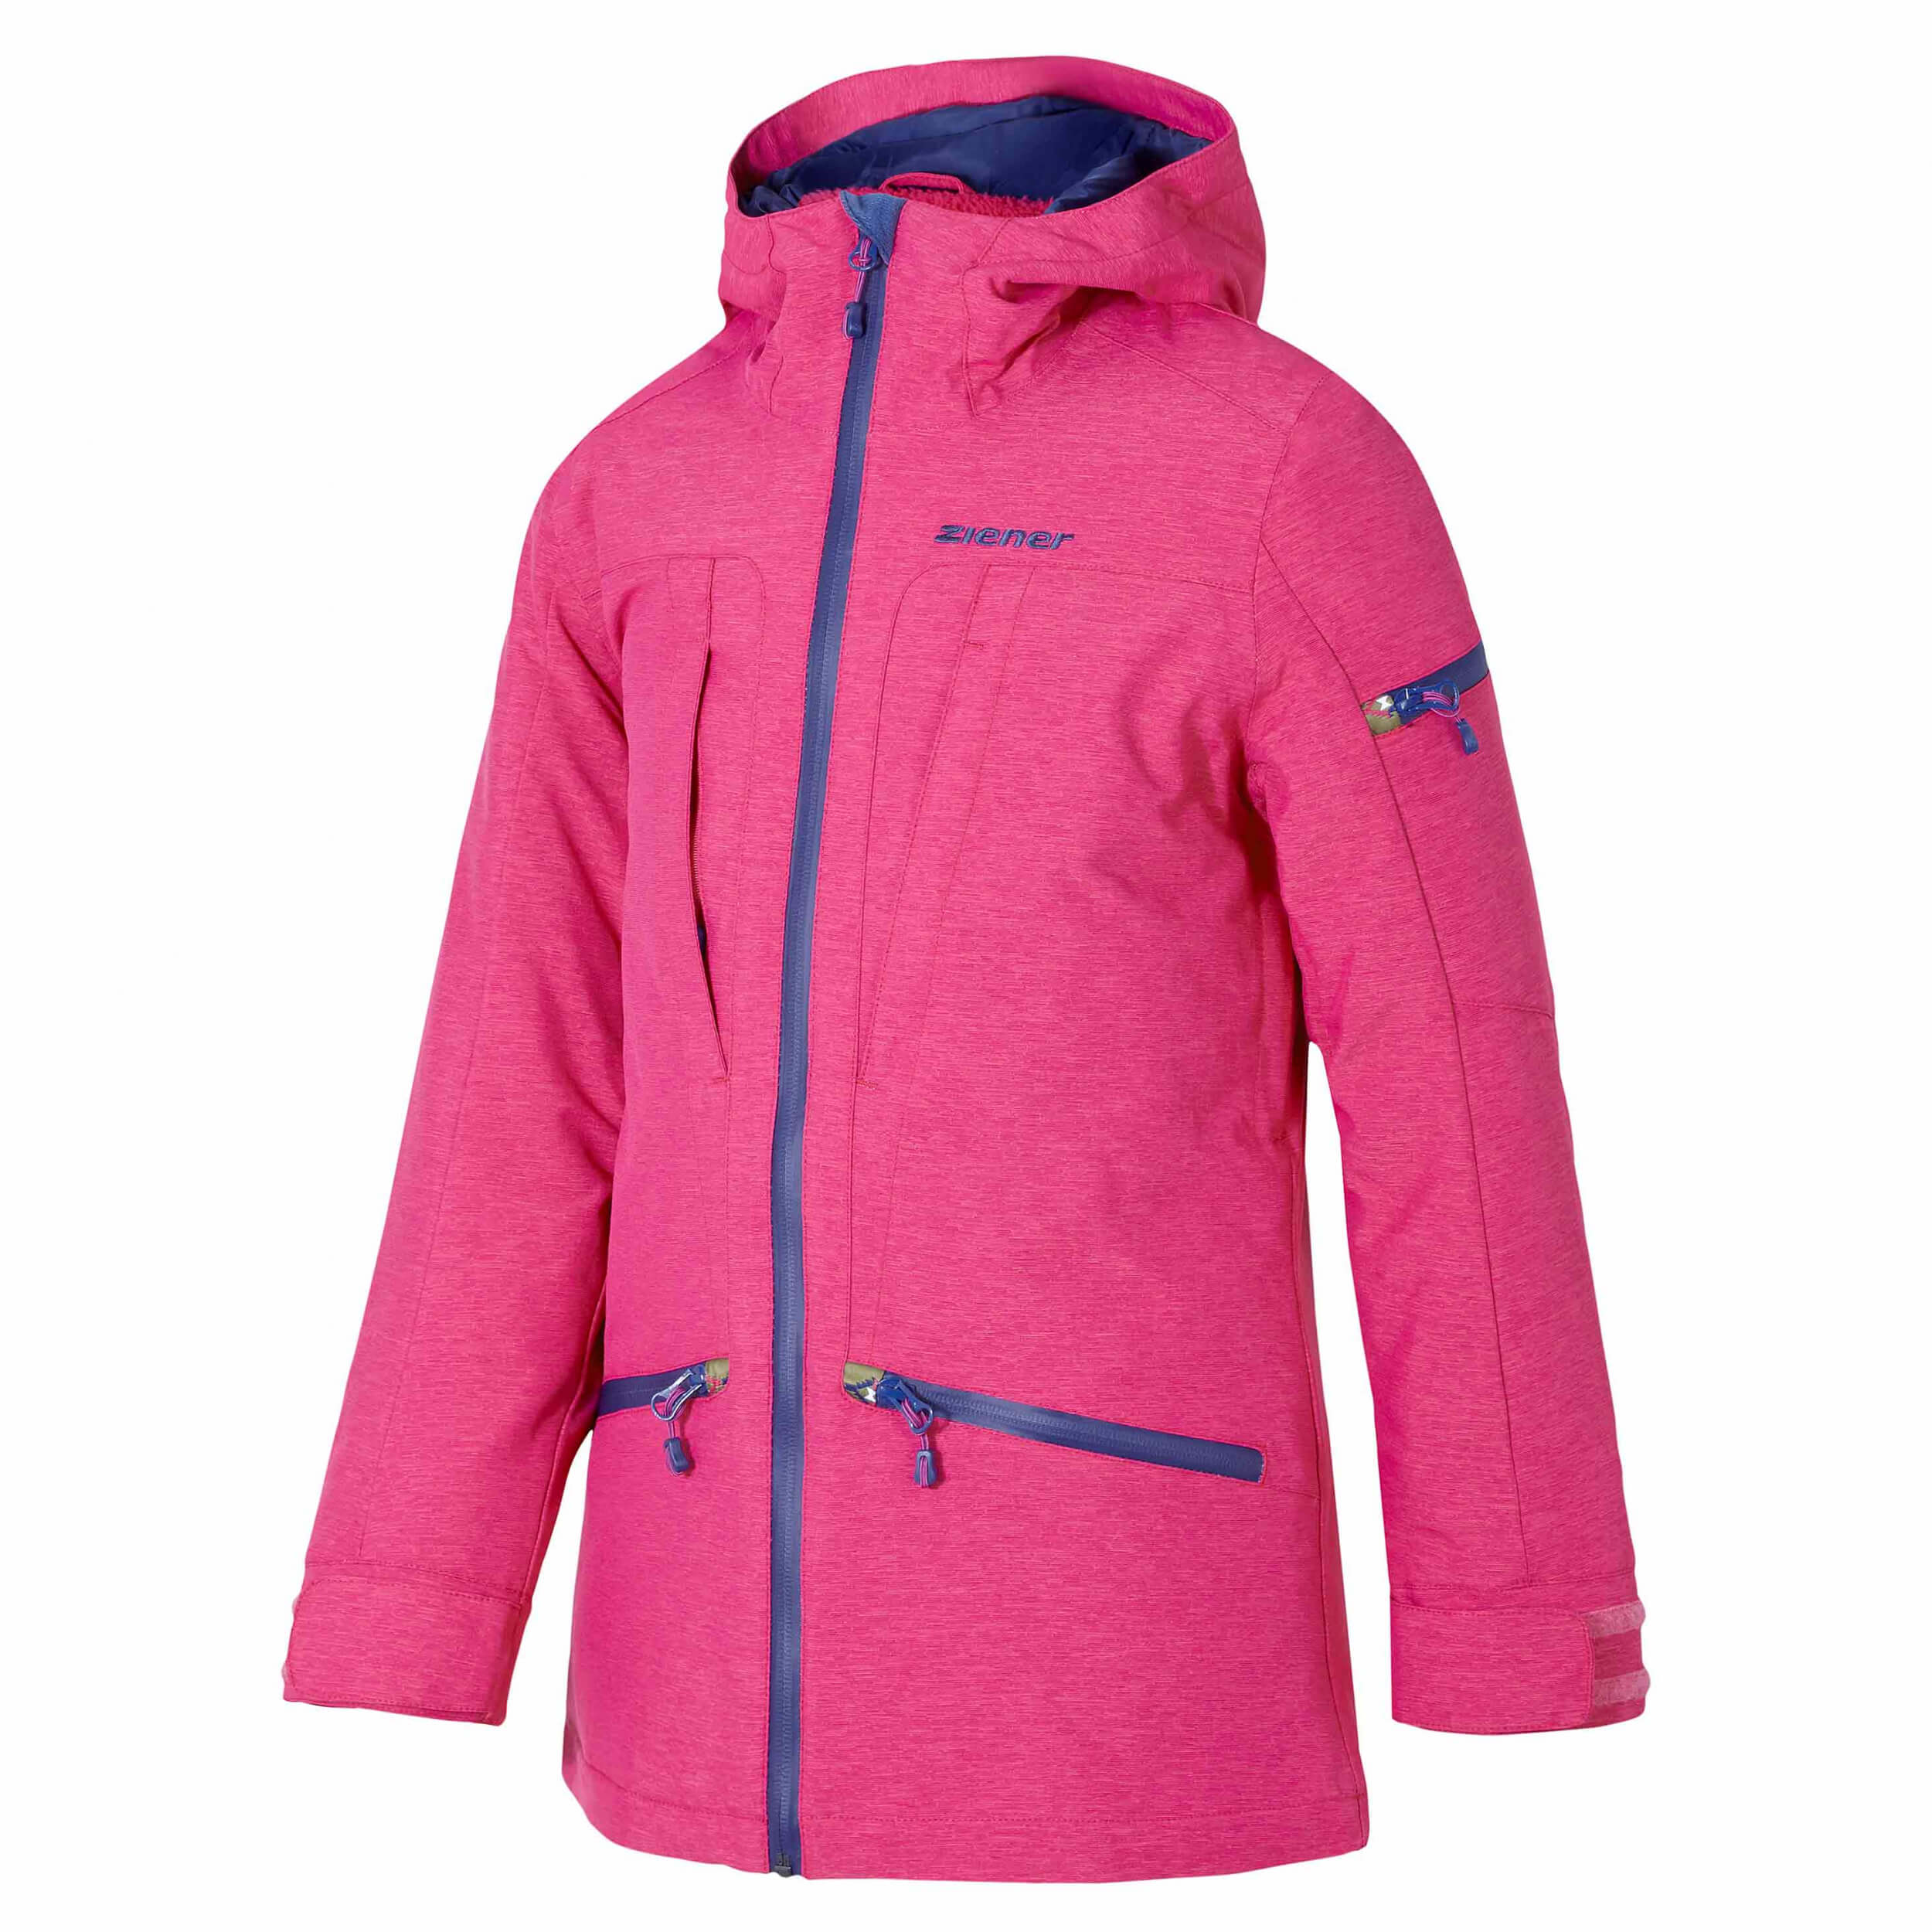 ZIENER Kinder Skijacke Yette pink 851